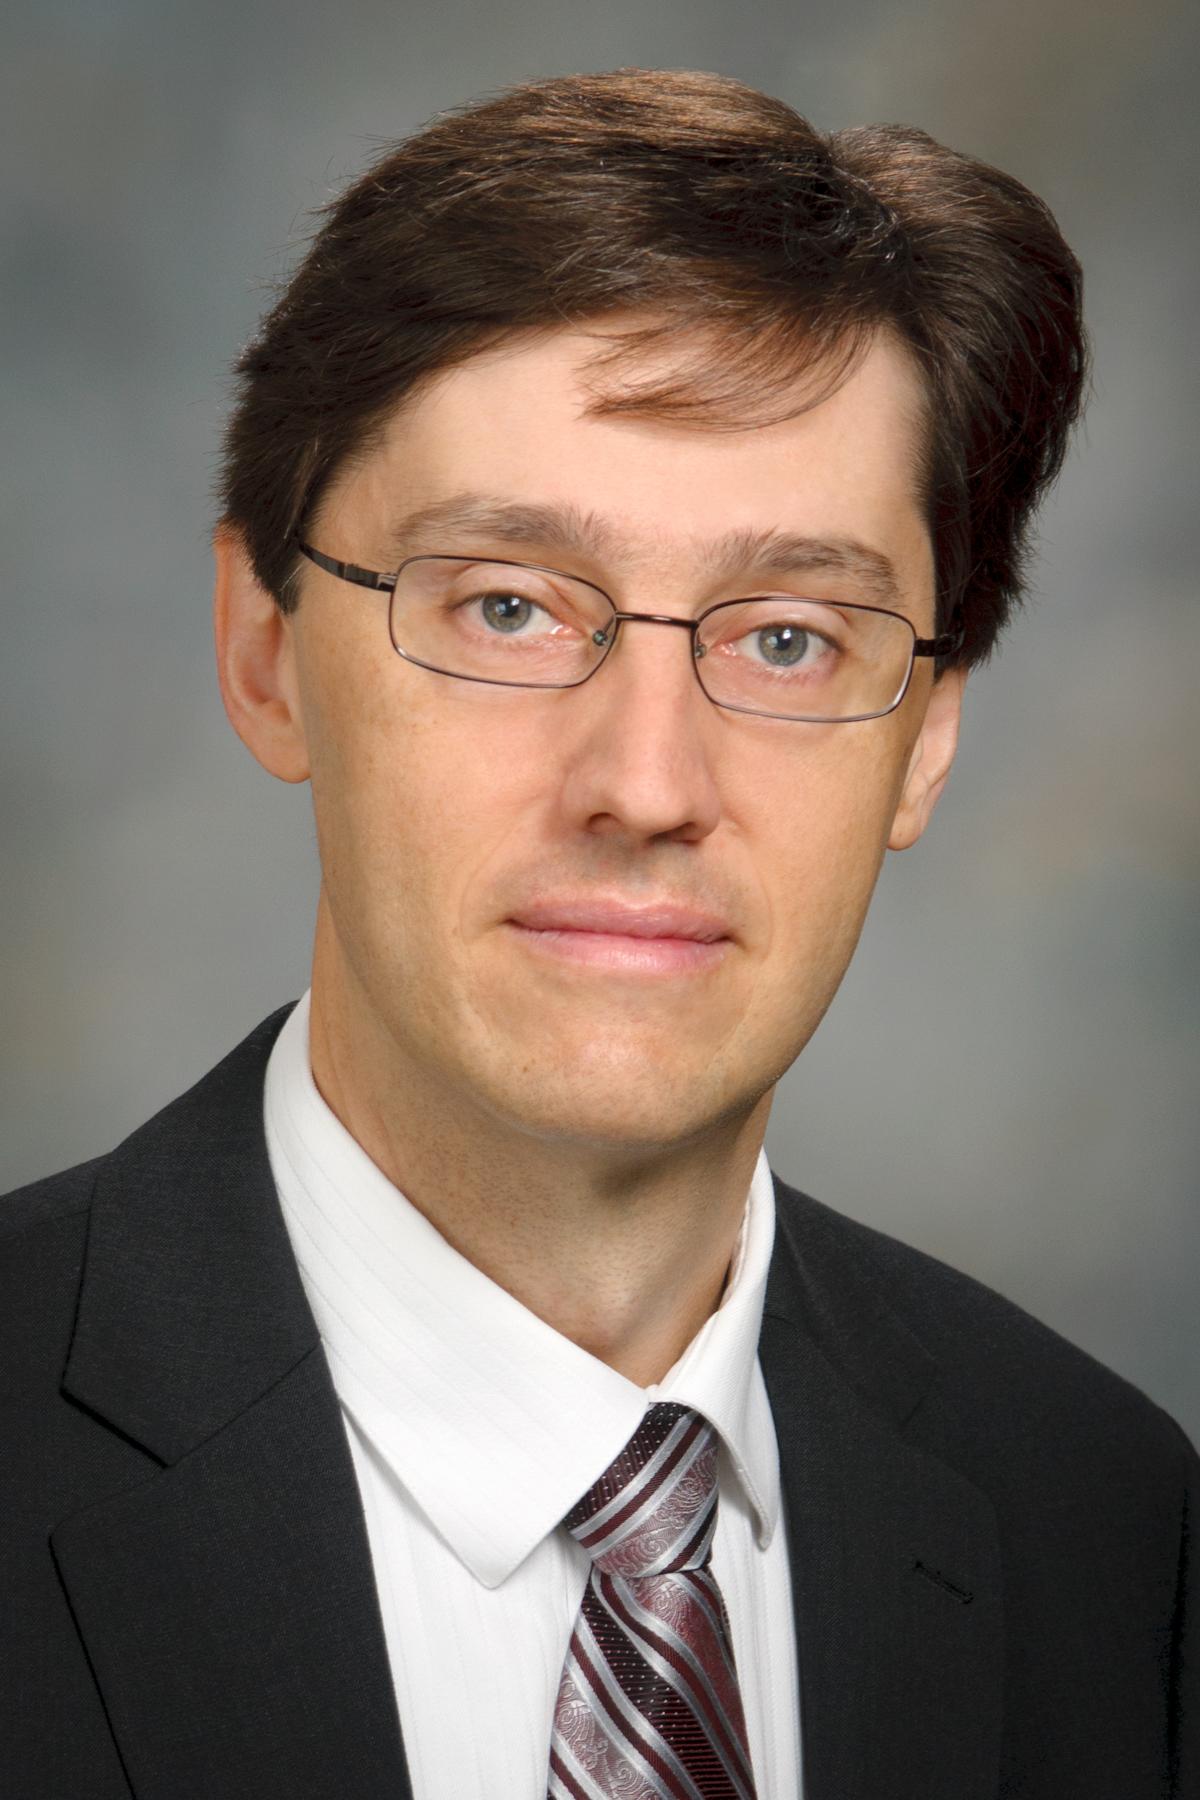 MD Anderson Cancer Center Strategic Industry Ventures- Prat, Ferran